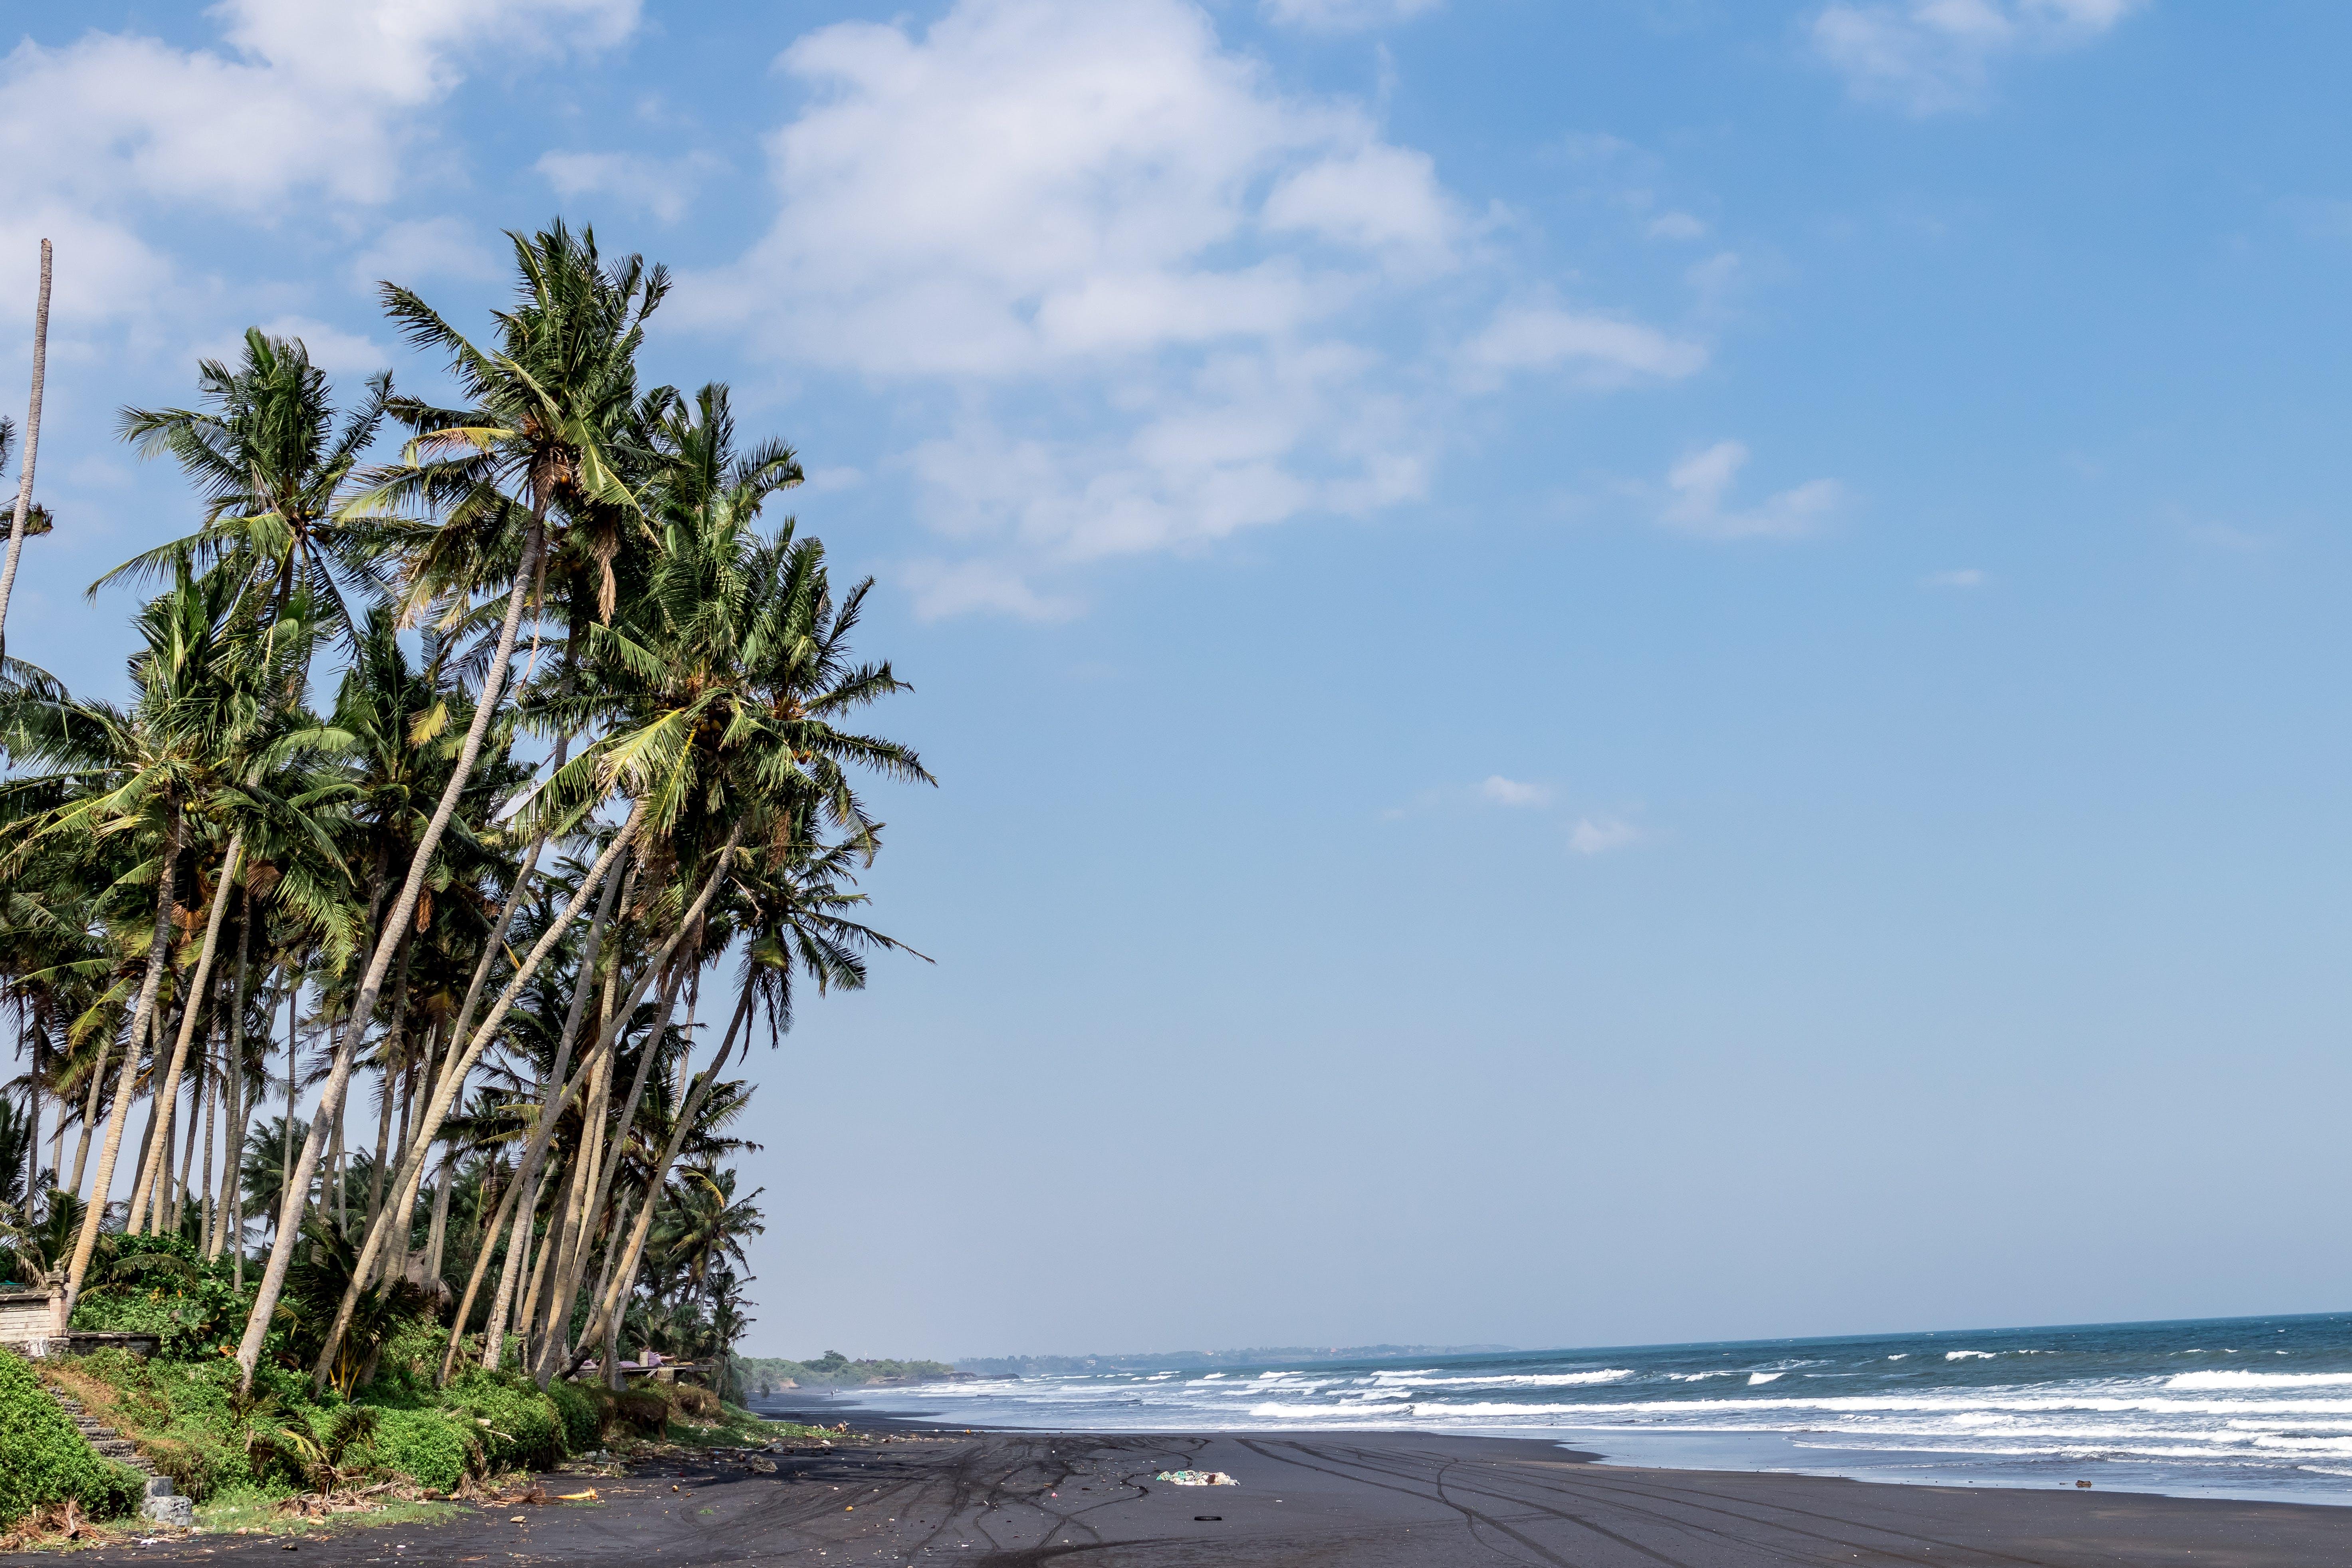 Green Coconut Trees Beside Body of Water